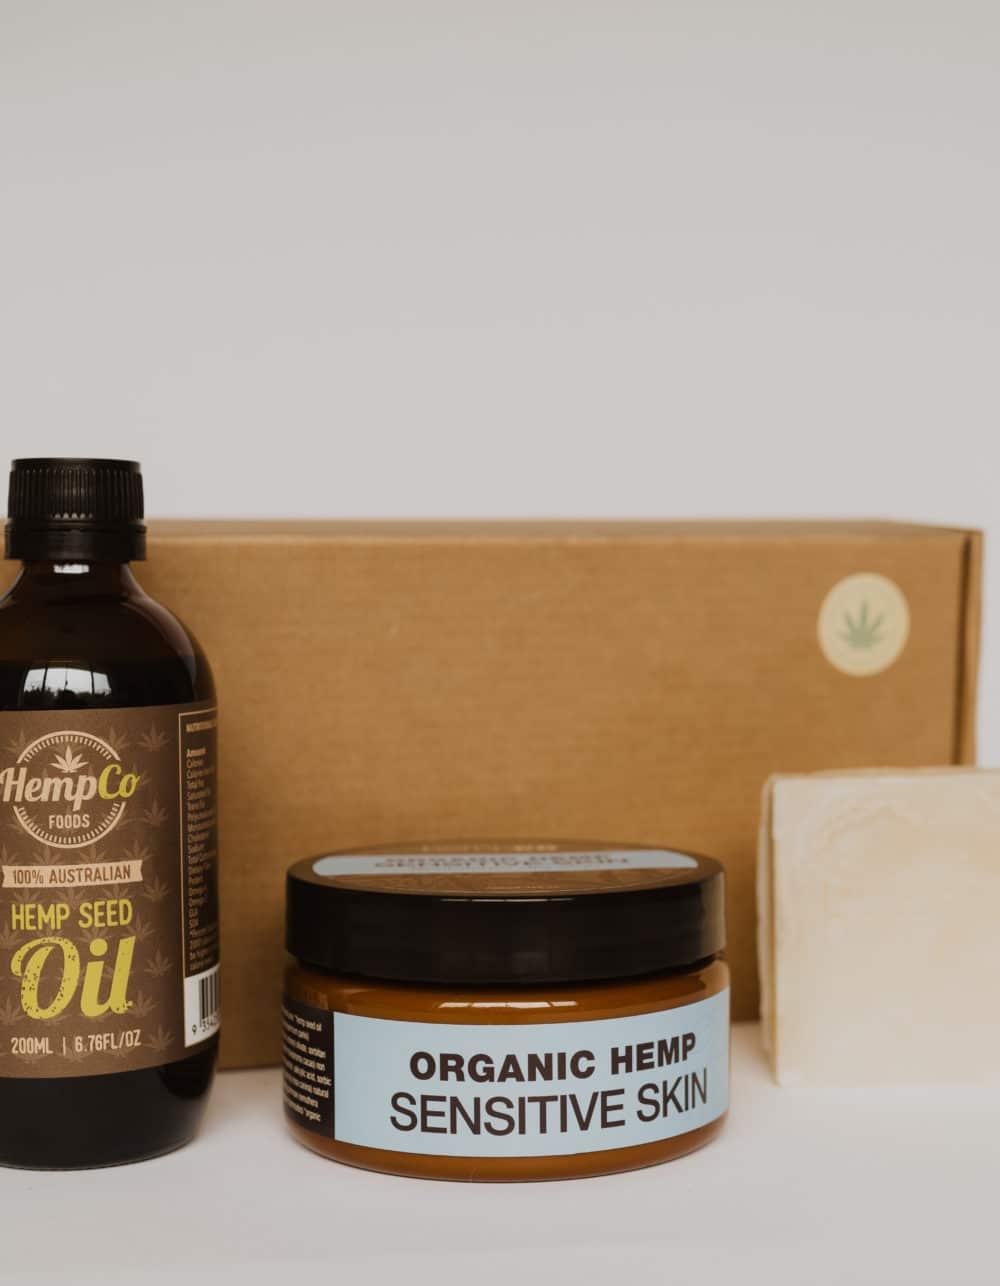 'Sensitive Skin' Hemp Gift Box